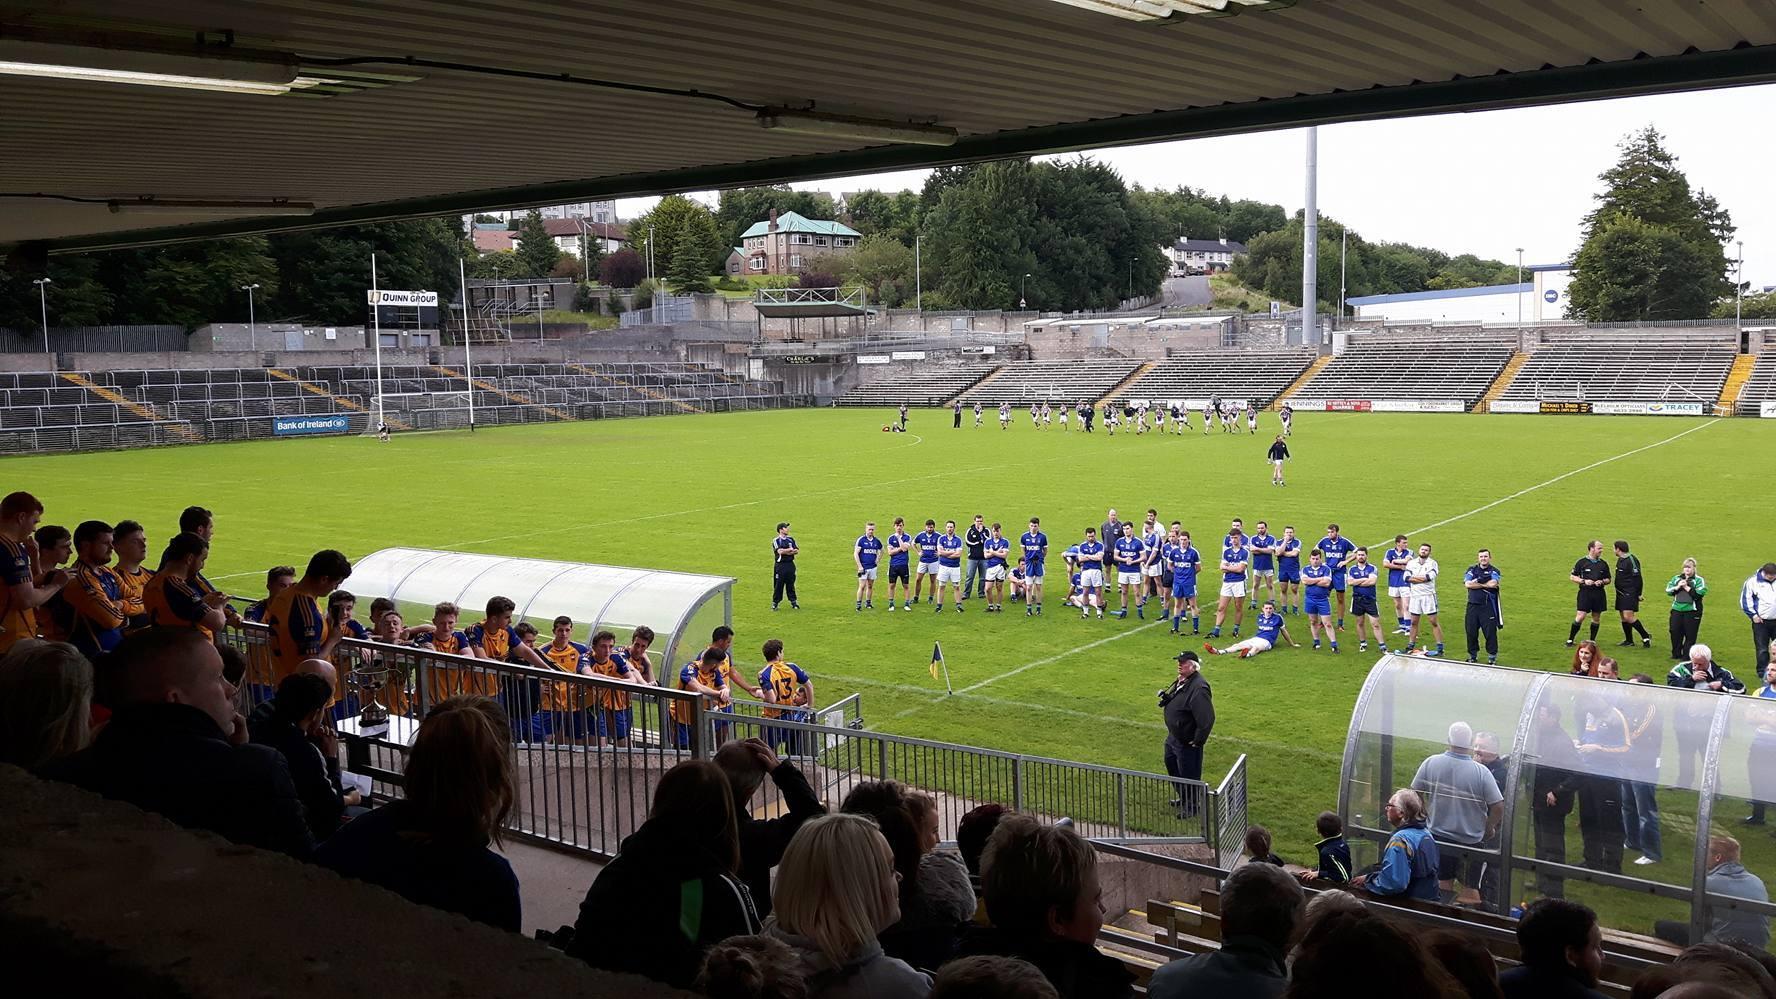 Enniskillen Gaels claim League success